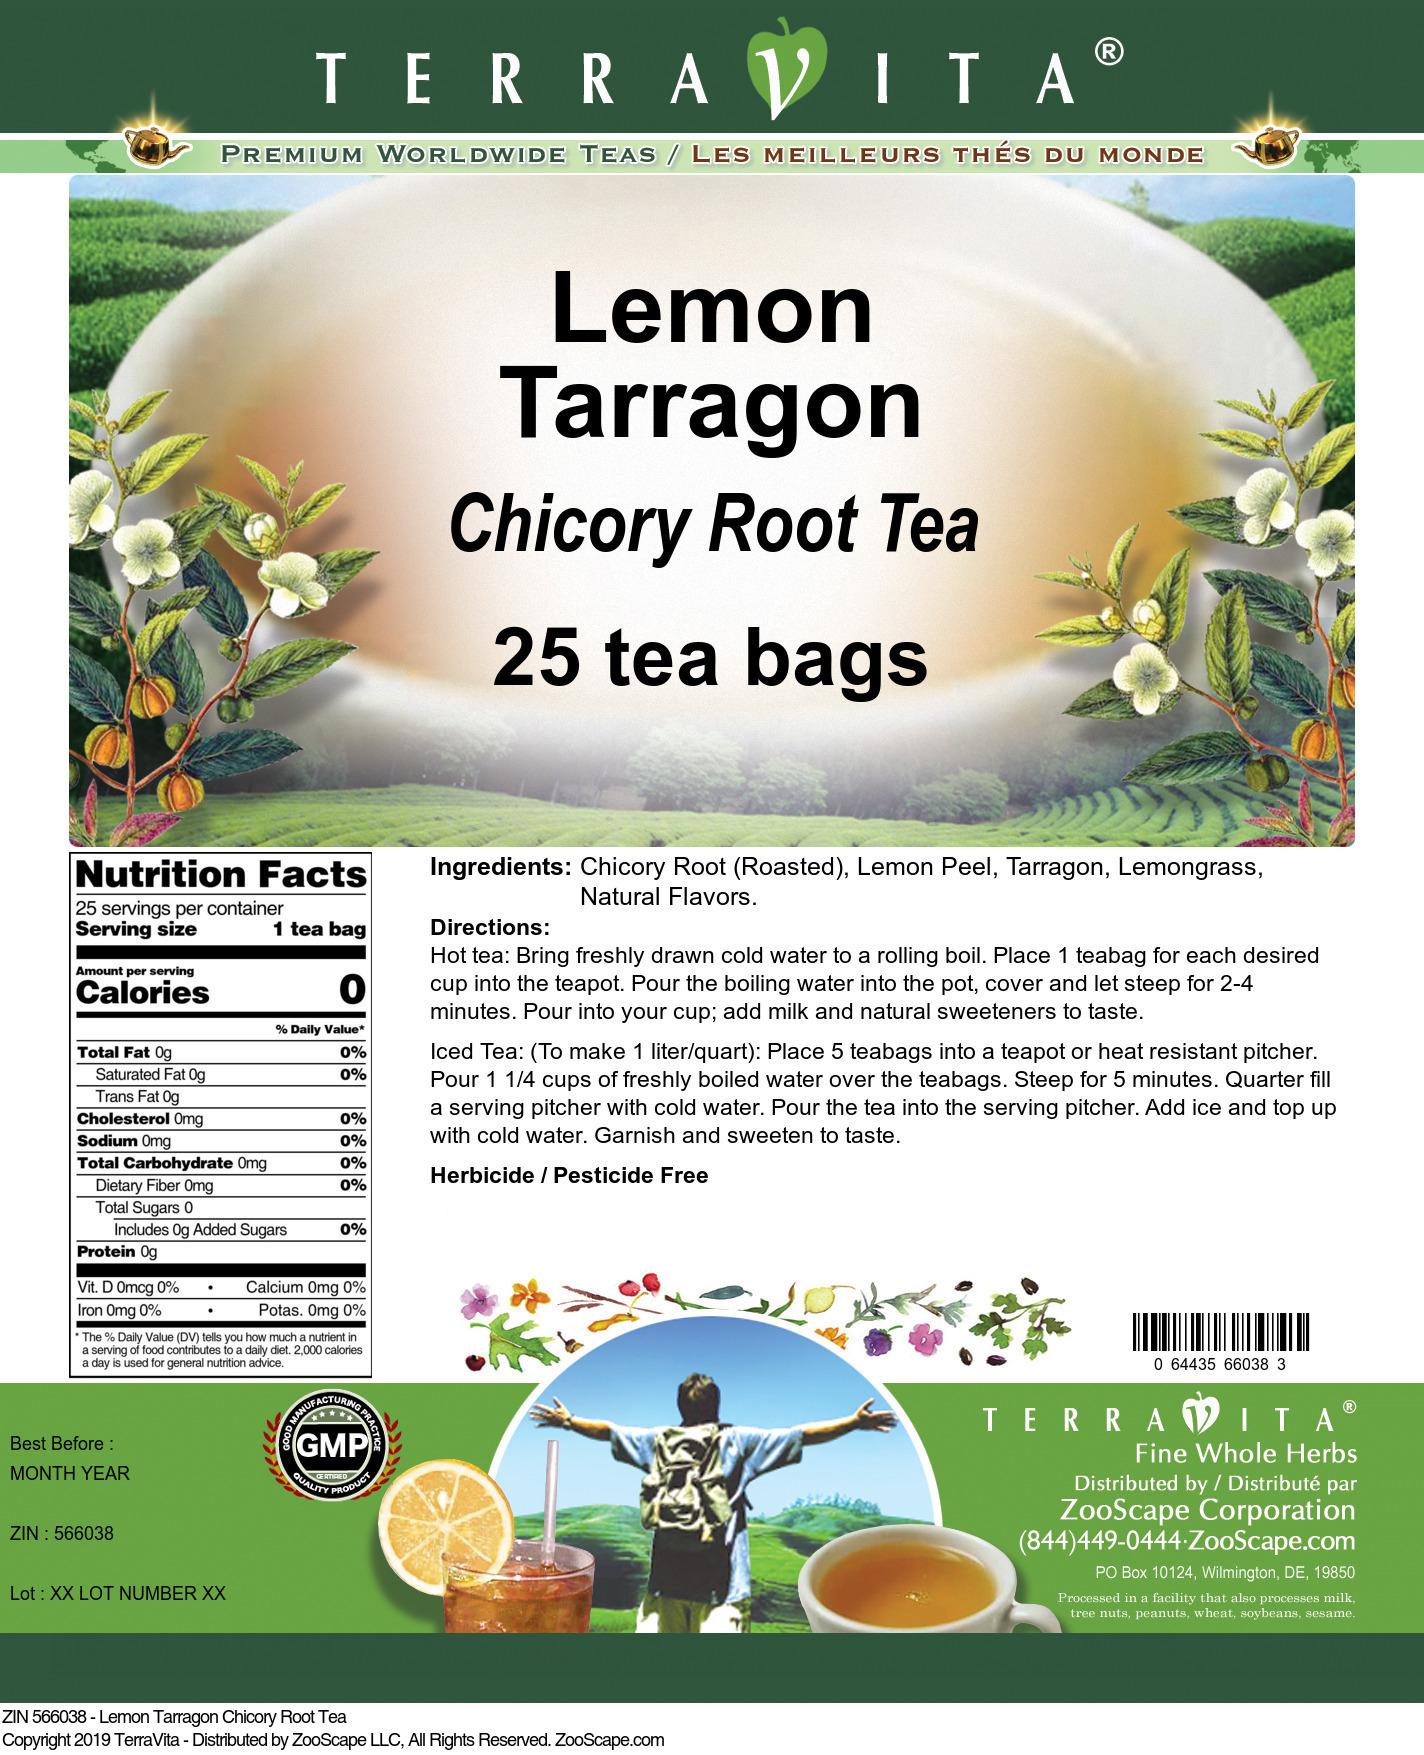 Lemon Tarragon Chicory Root